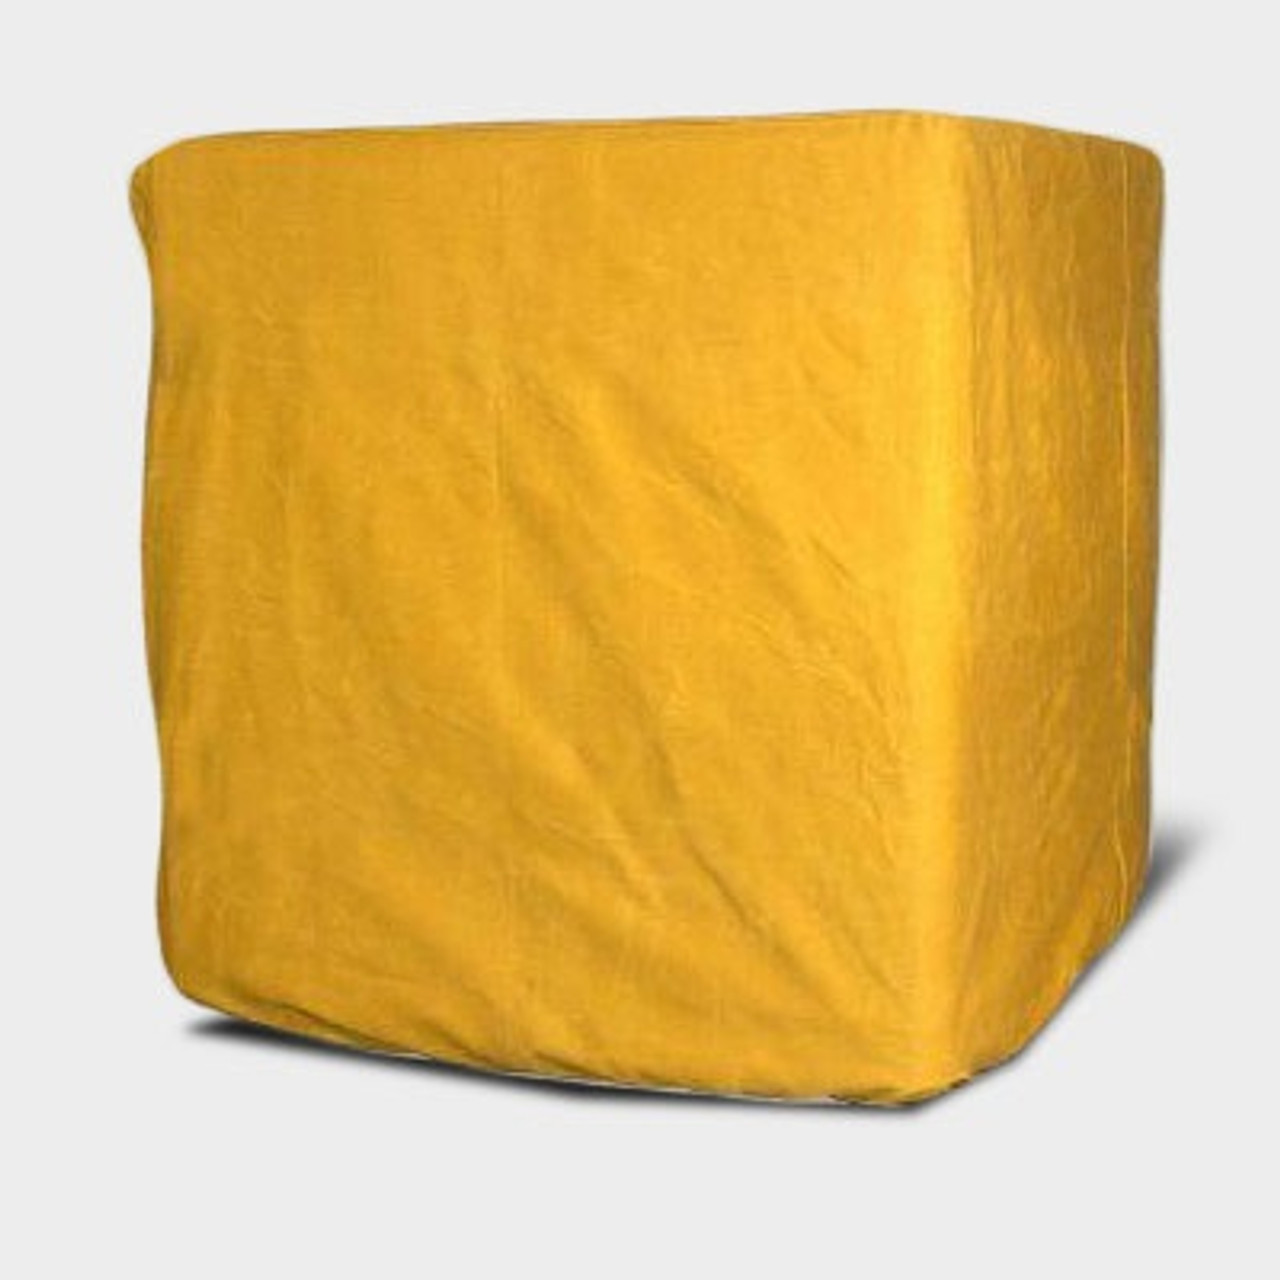 42 x 48 x 35 swamp cooler cover downdraft canvas indoor - Mastercool exterior cooler cover ...